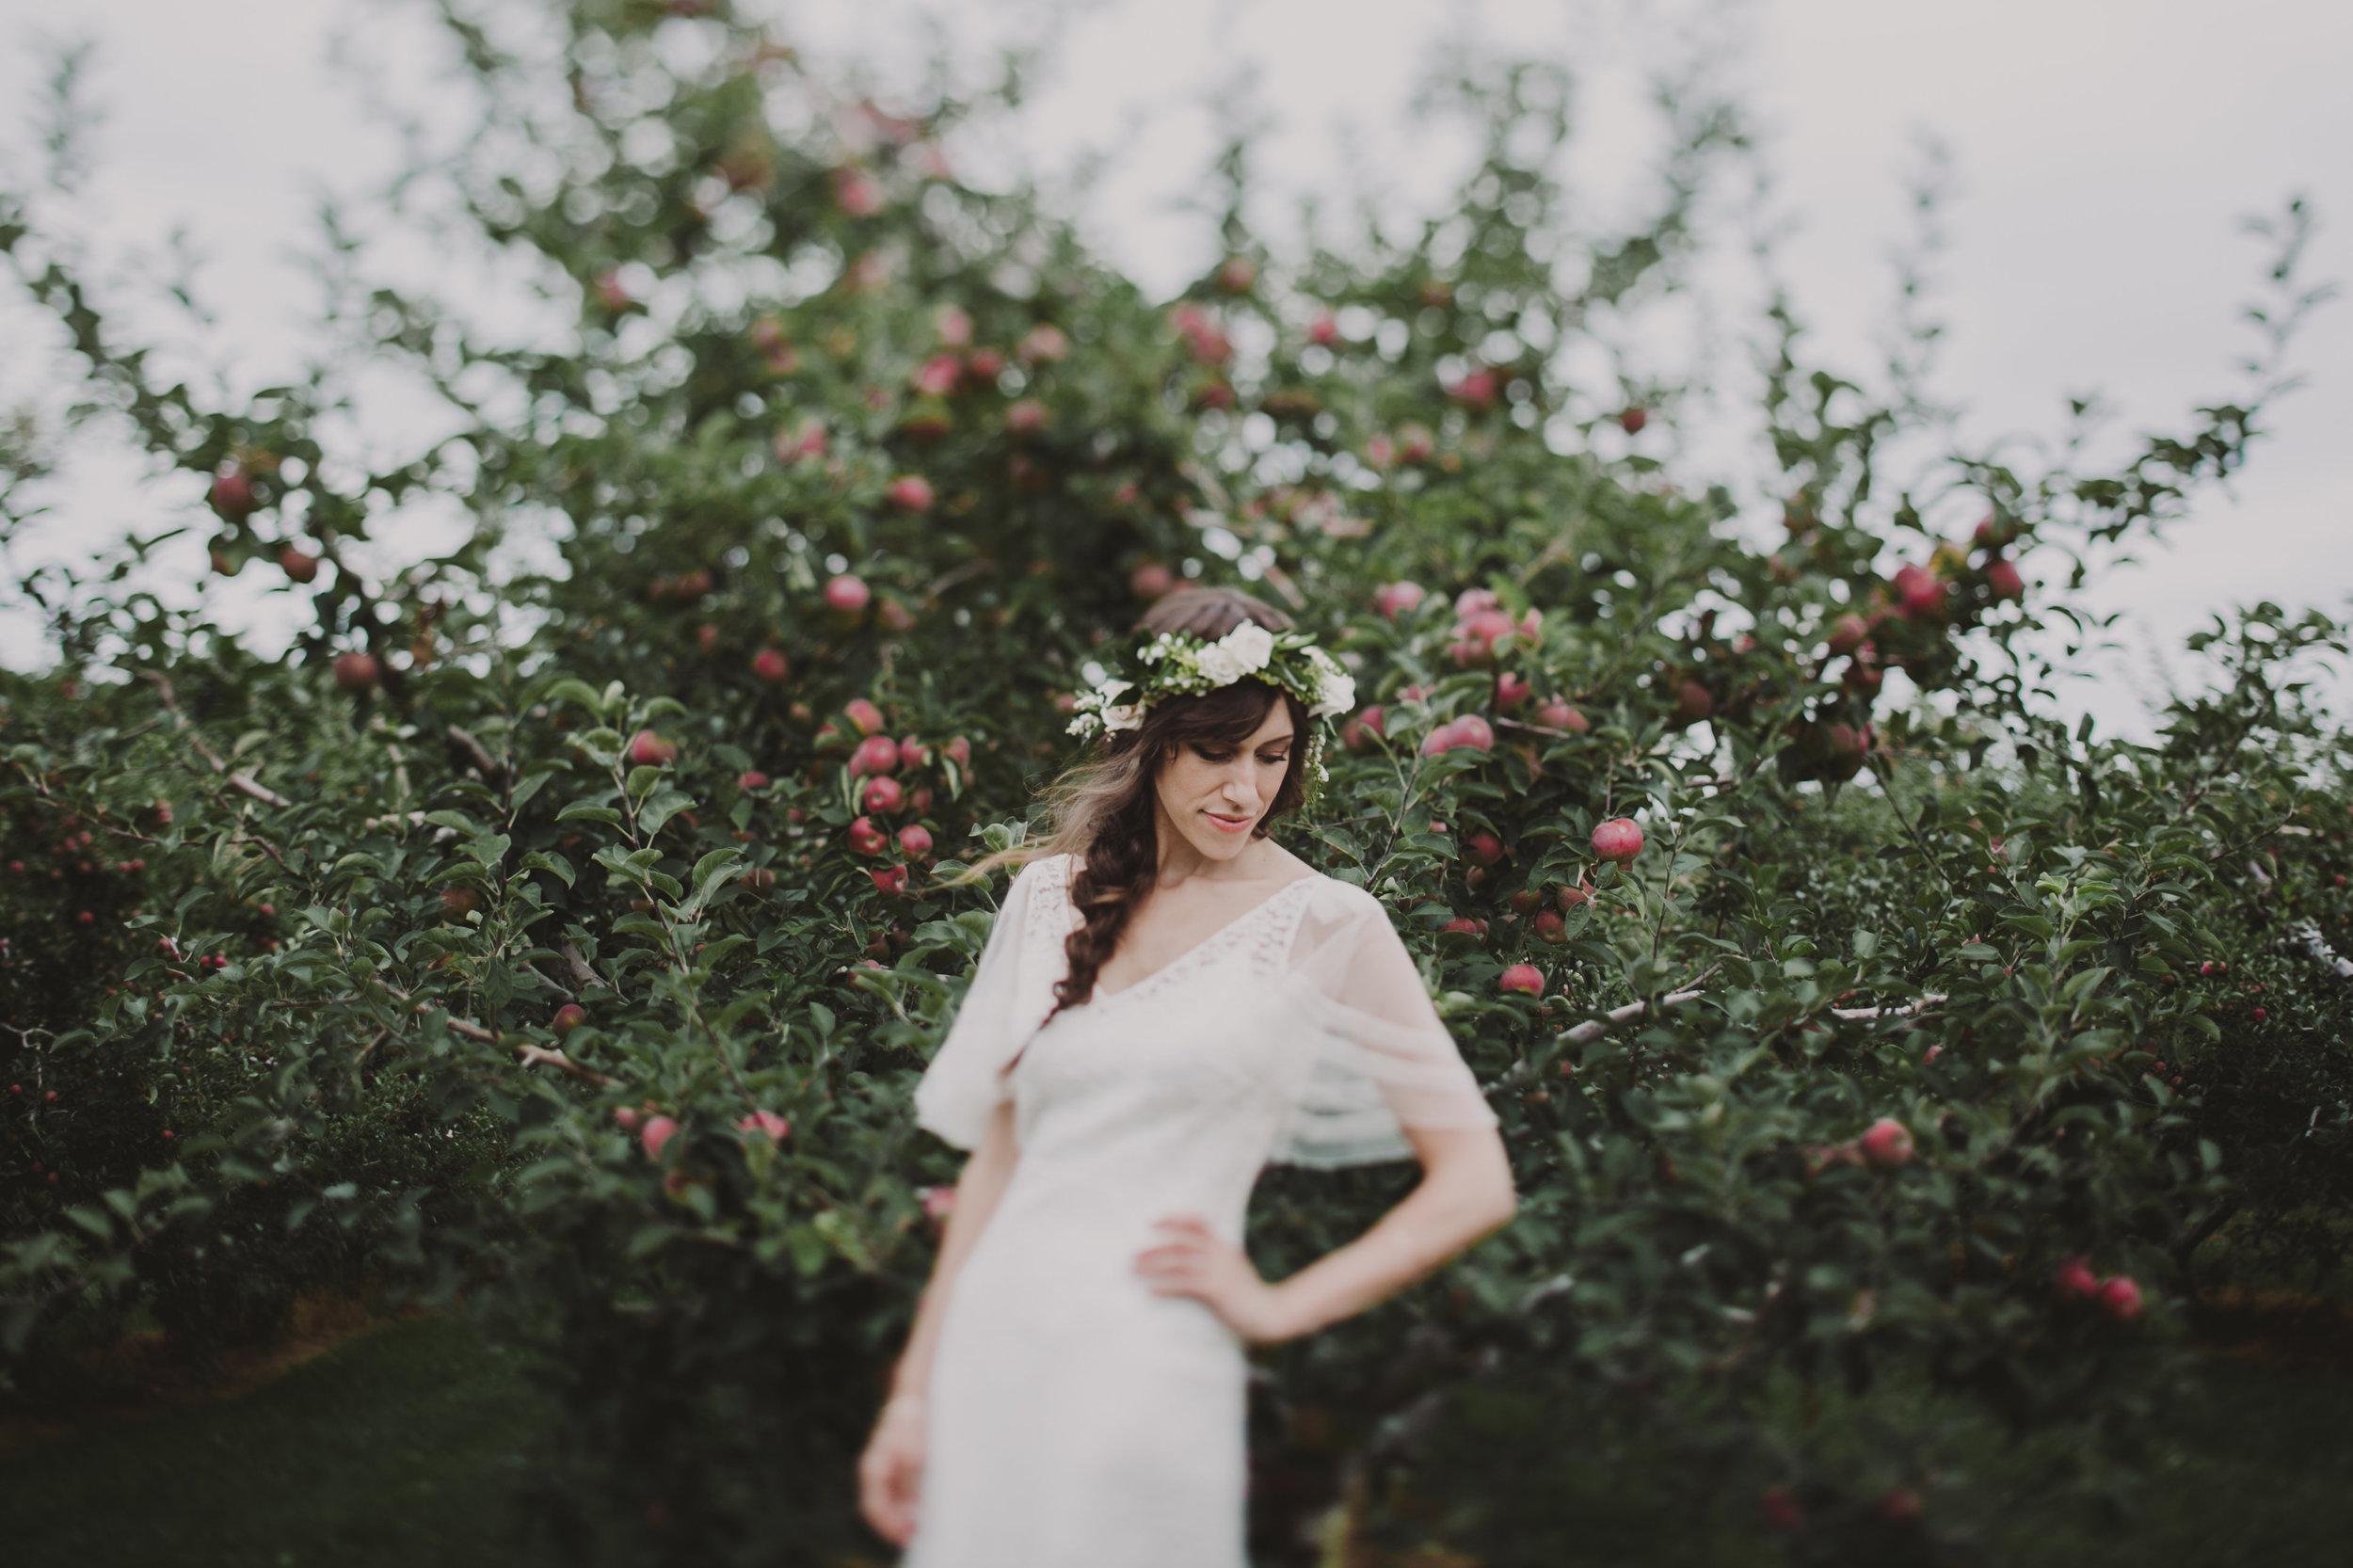 LIBERTY_VIEW_FARM_HIGHLAND_NY_WEDDING_CHELLISE_MICHAEL_PHOTOGRAPHY801.JPG